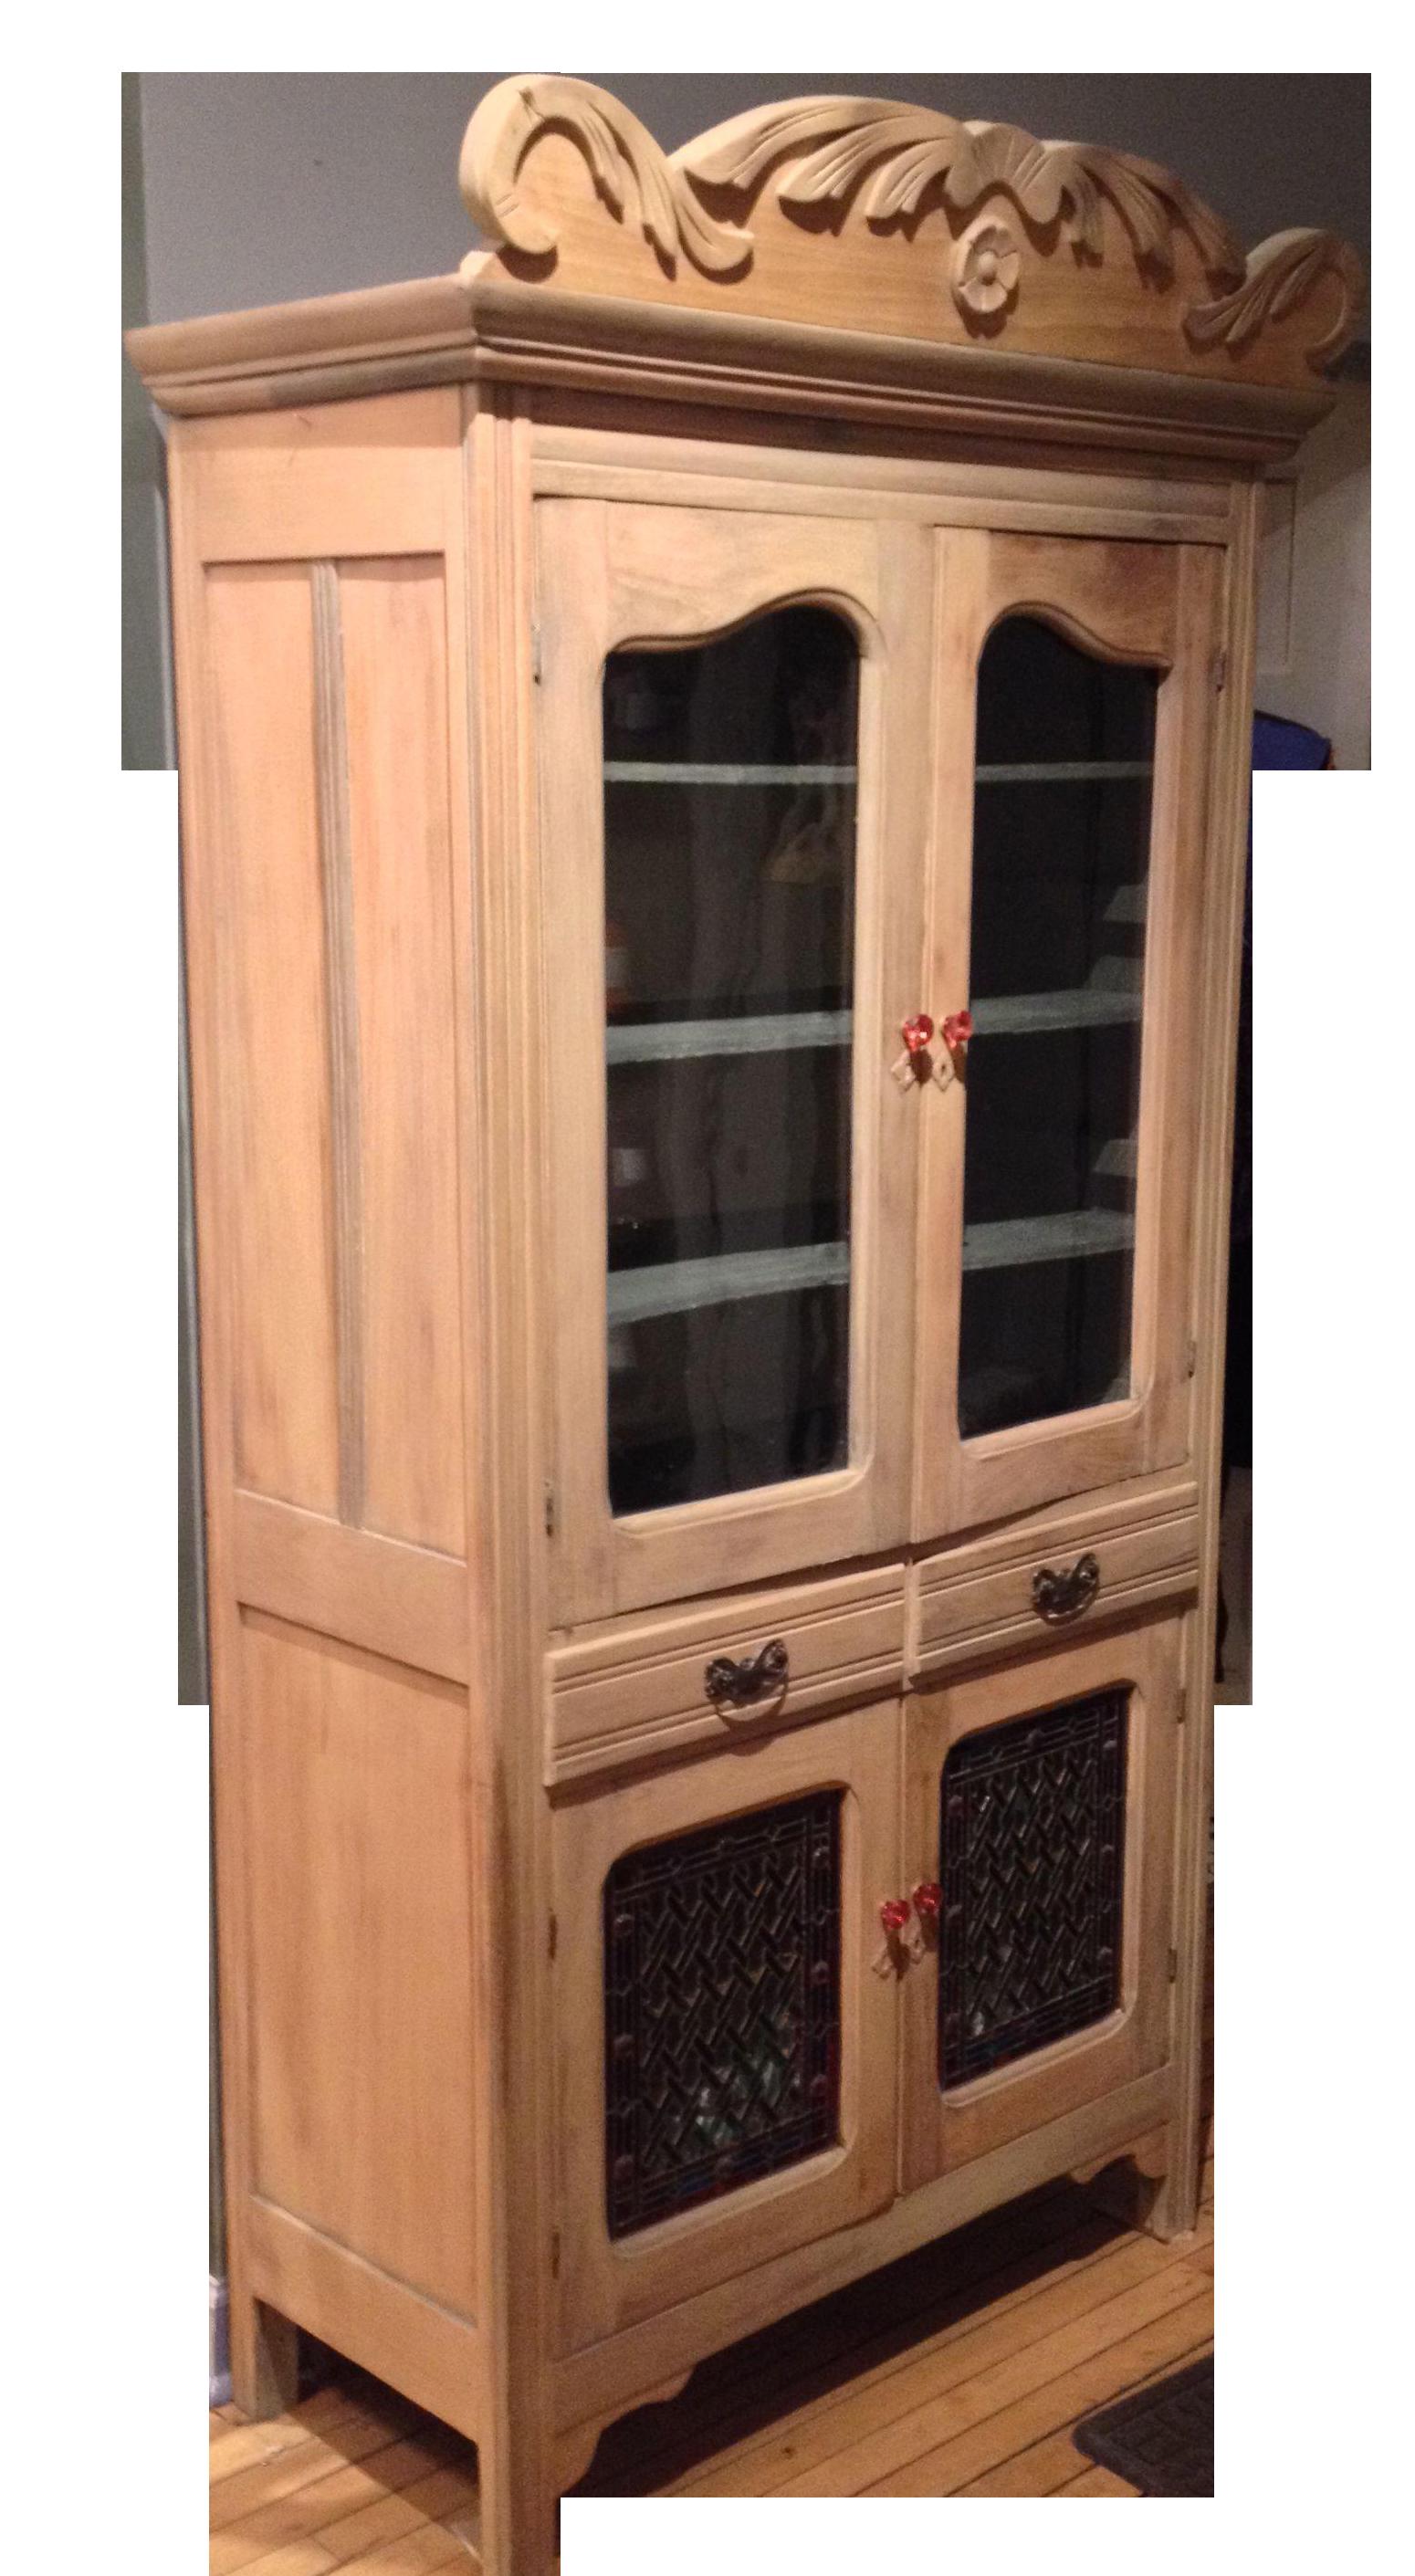 Antique pine cabinet antique furniture for Antique pine kitchen cabinets